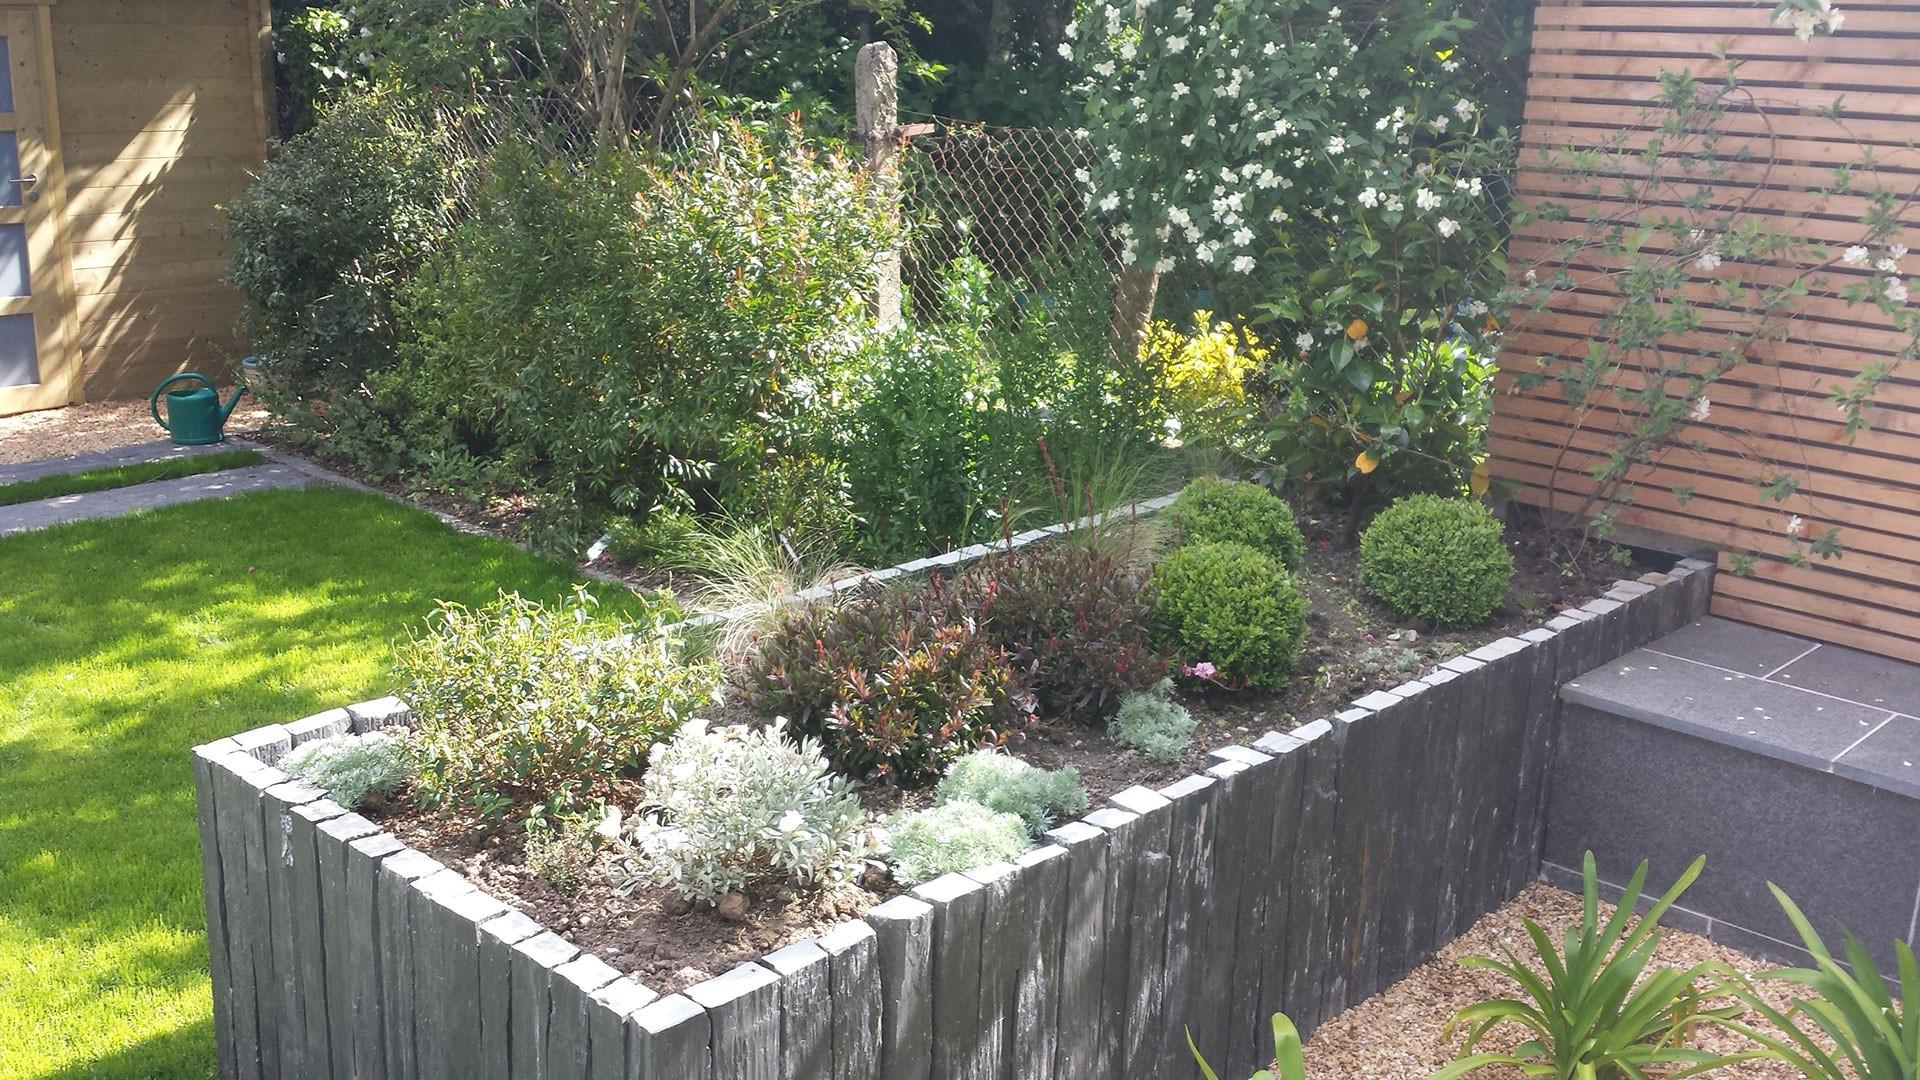 Bordure Jardin originale Inspirant Photos 48 Simple Idées De Les Bordures De Jardin